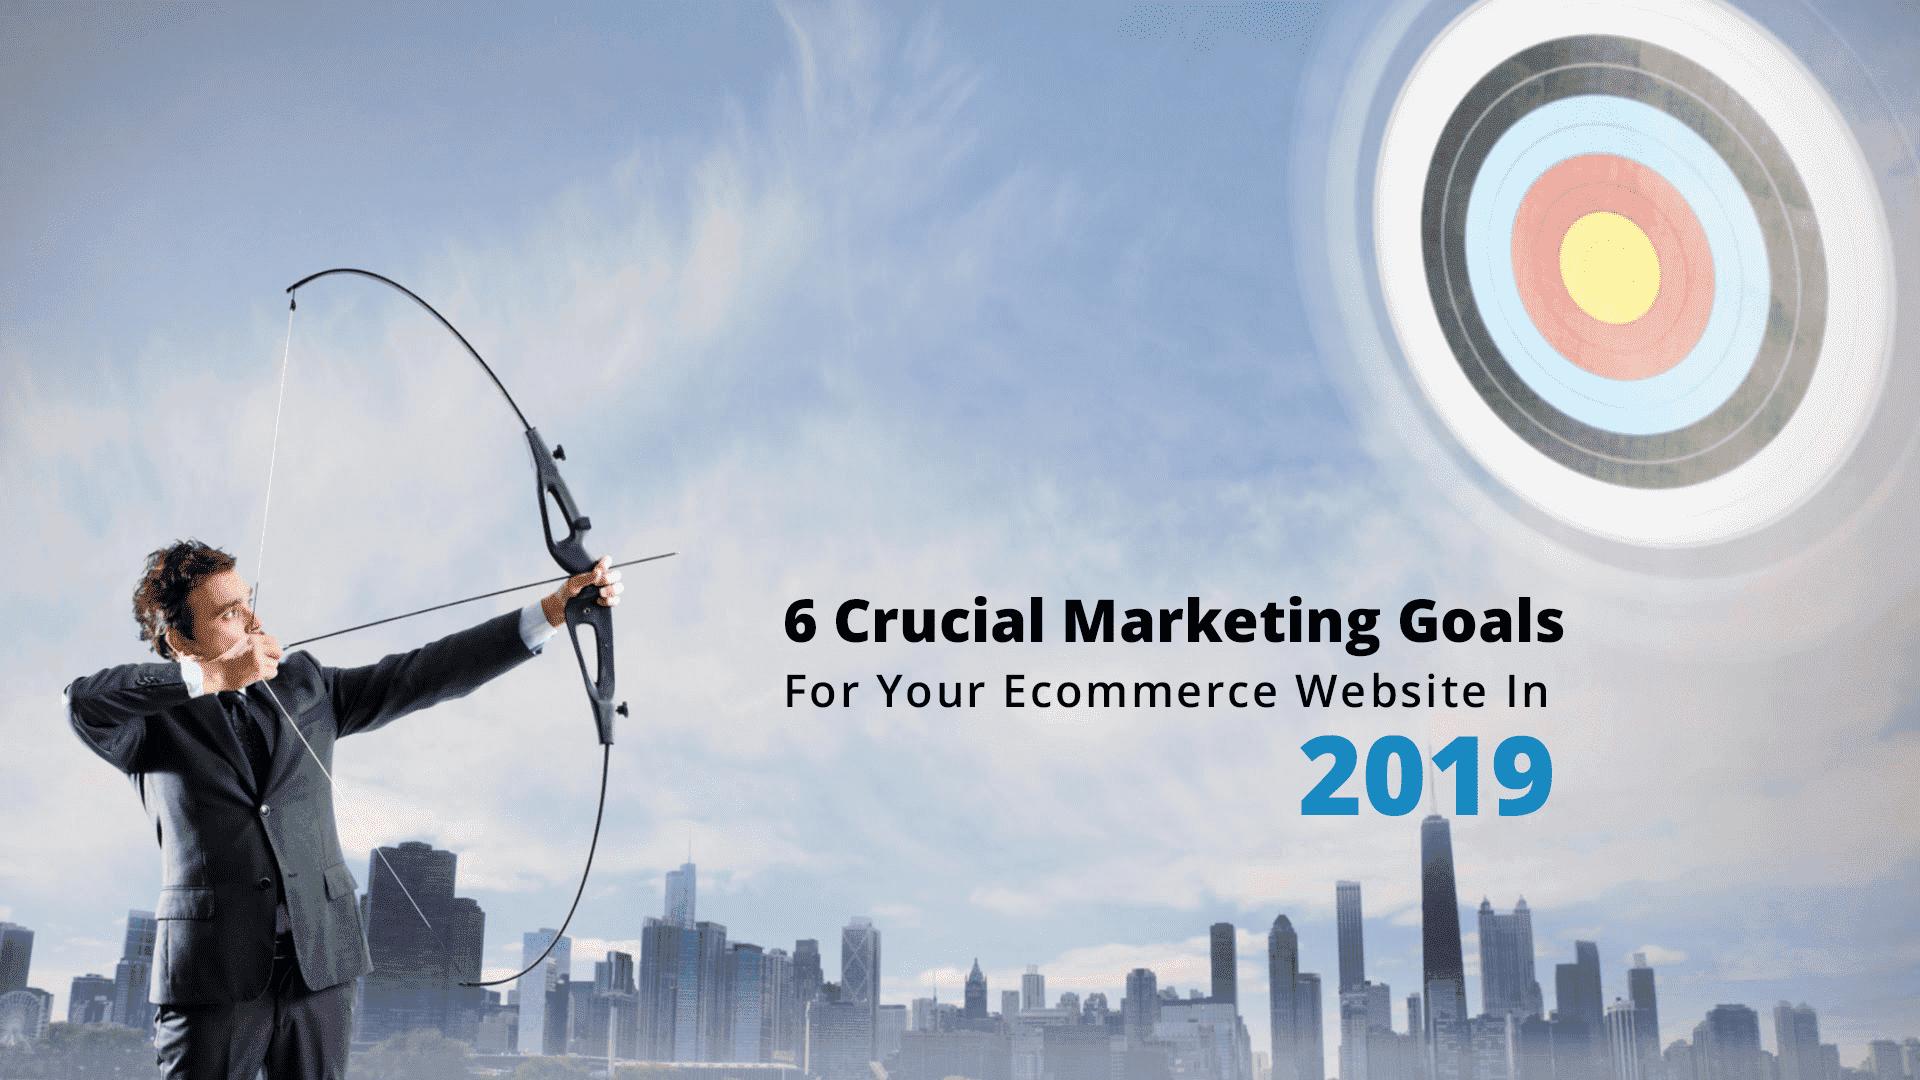 ecommerce-website-goals-min